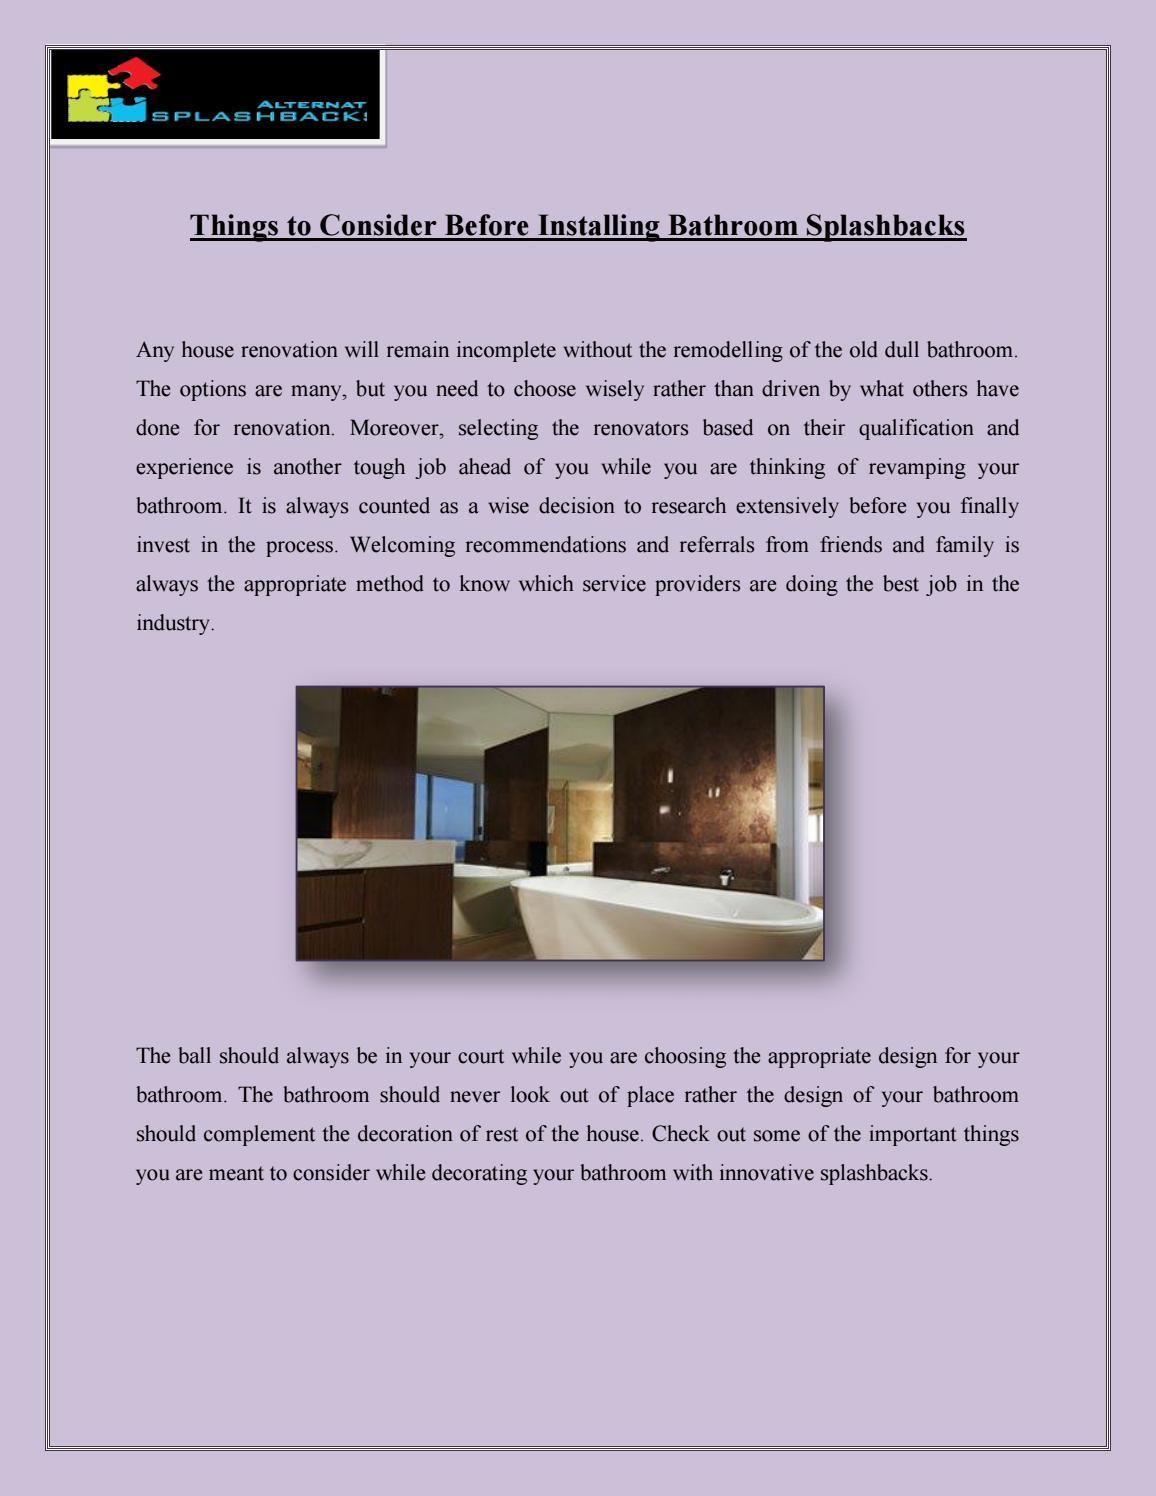 Bathroom Design Qualification things to consider before installing bathroom splashbacks